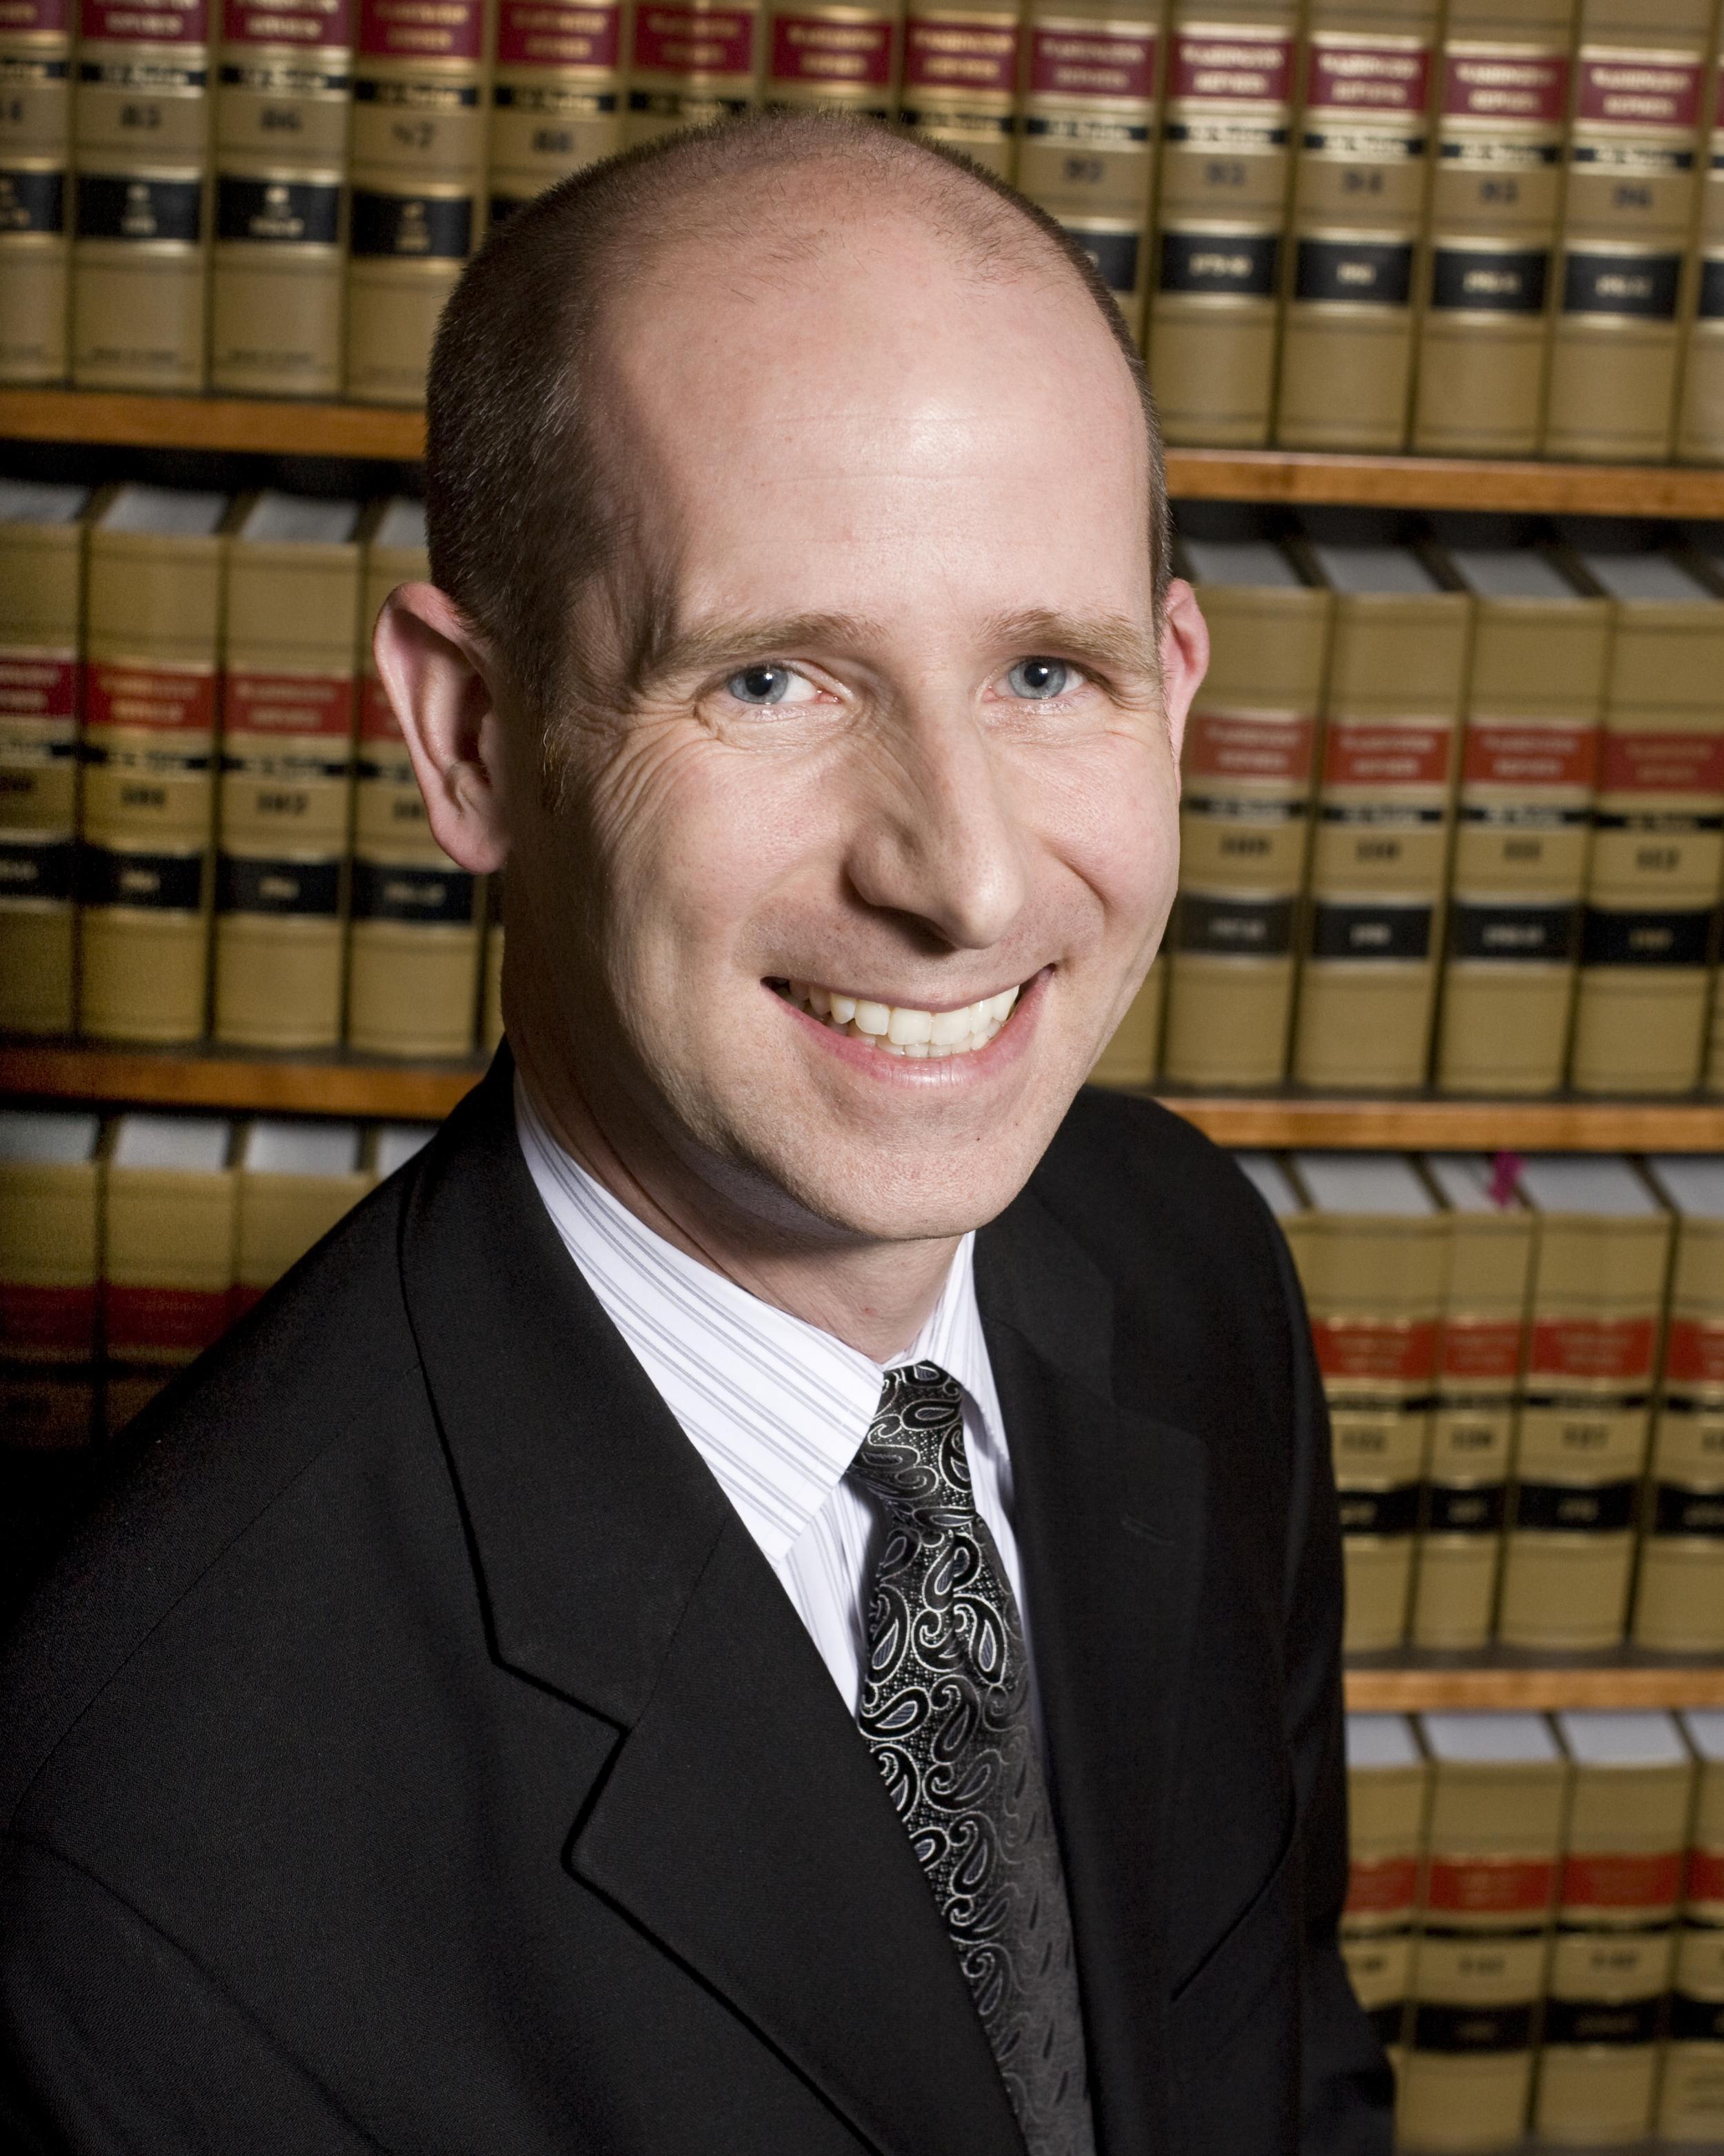 Richard-Spoonemore-Rick-Spoonemore-Sirianni-Youtz-Spoonemore-Hamburger-Litigation-Law-Seattle-Washington